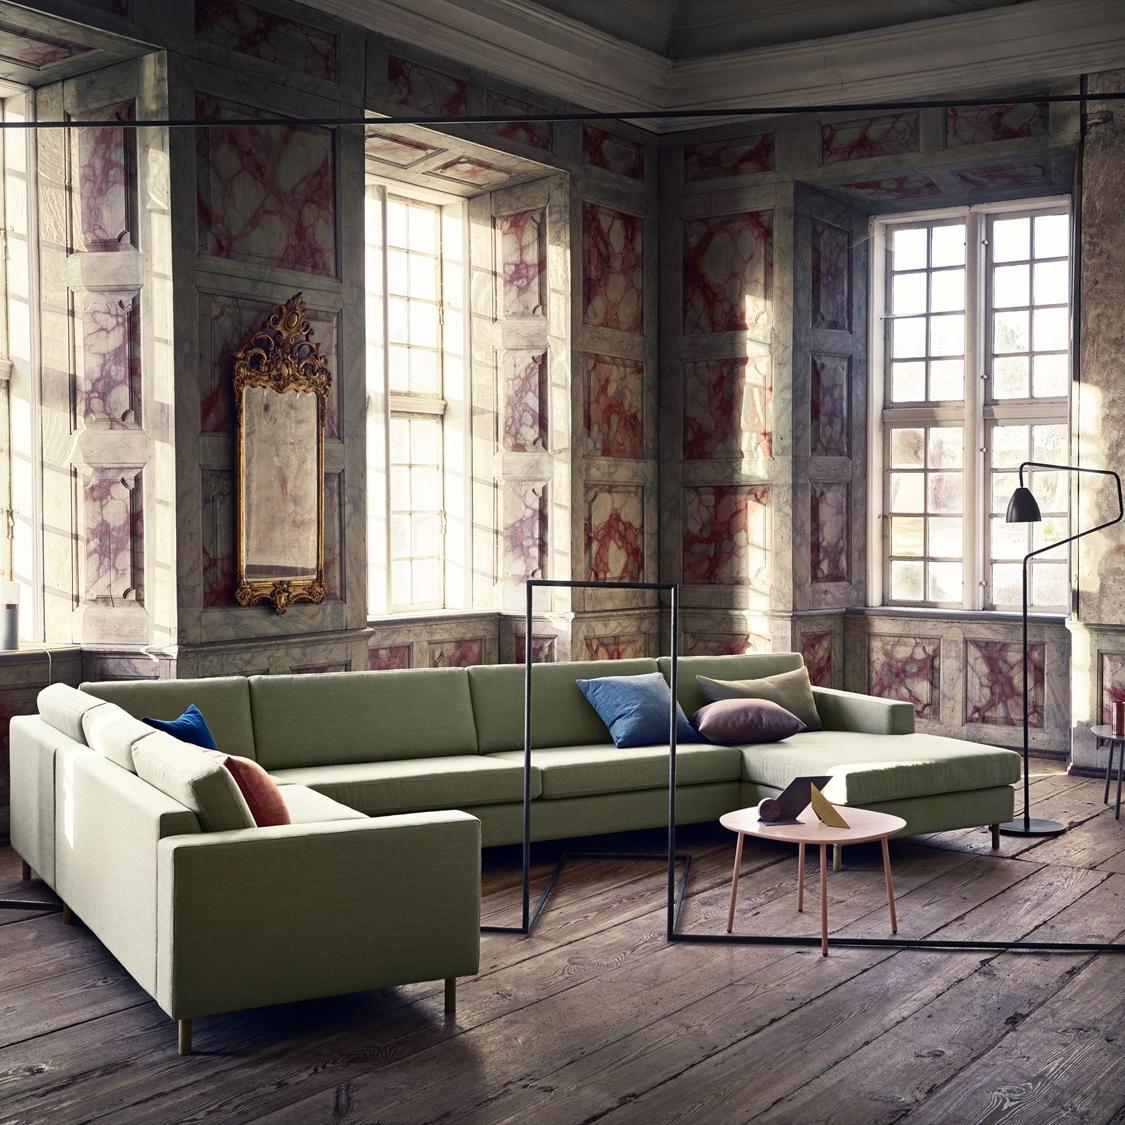 10 High End And Handsome Contemporary Sofas